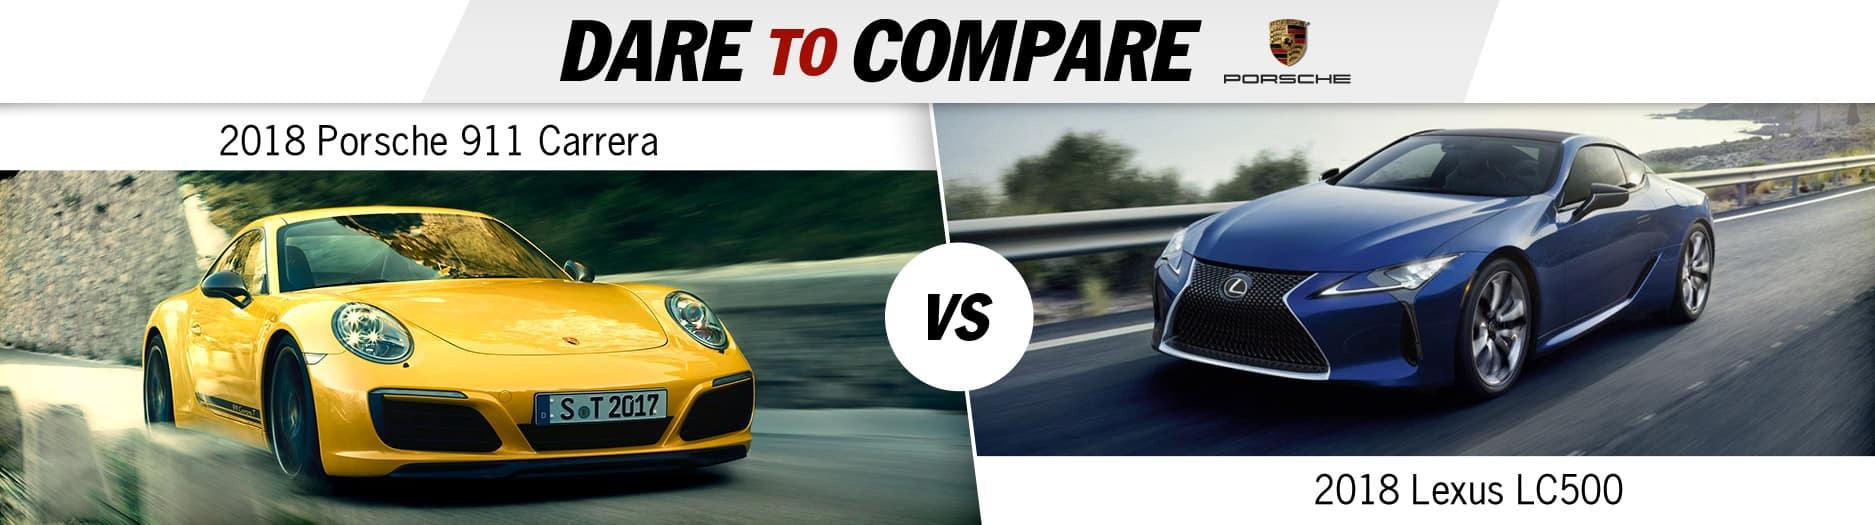 2018 Porsche 911 Carrera vs. Lexus LC500